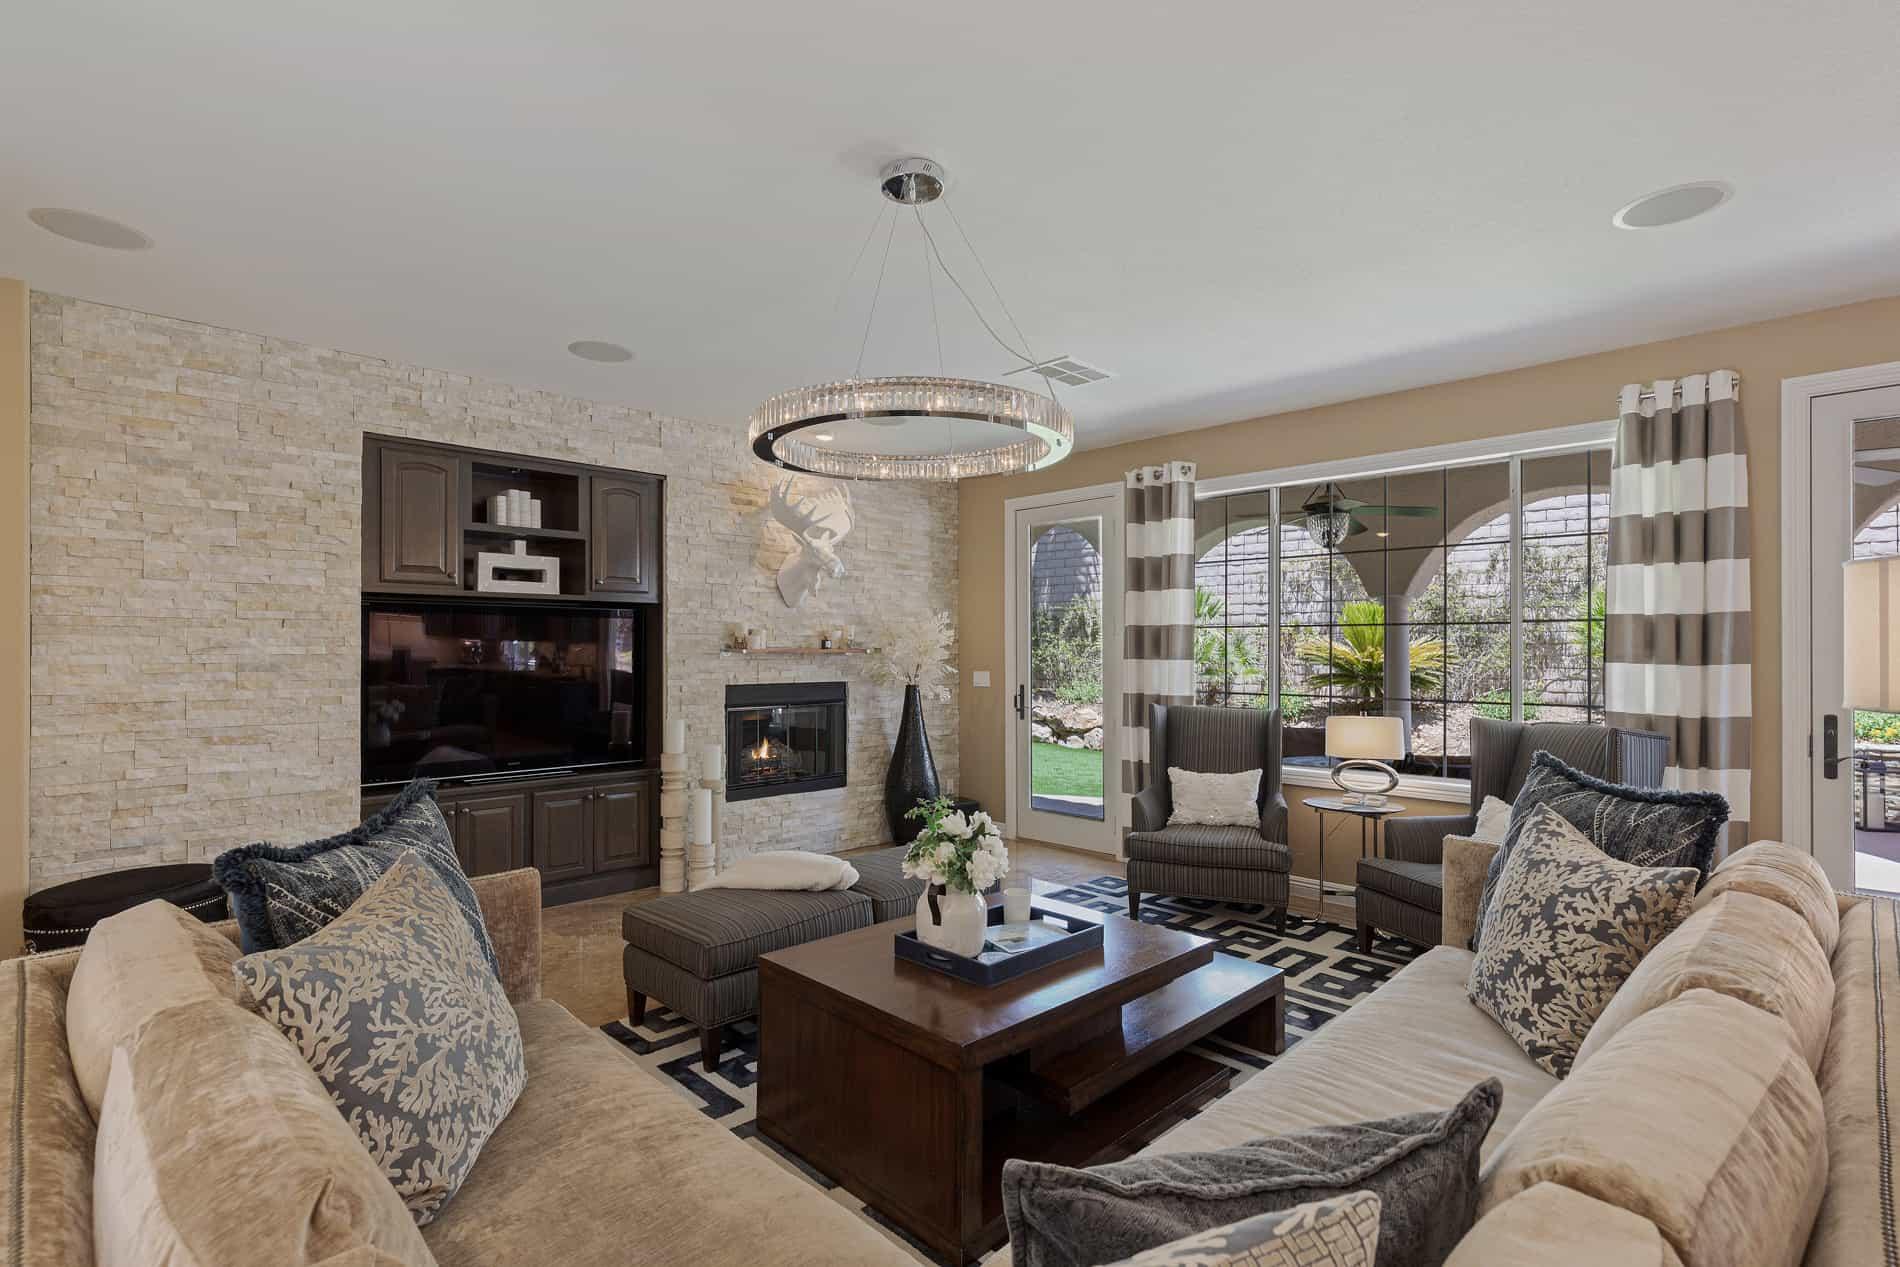 las-vegas-luxry-real-estate-realtor-rob-jensen-company-12108-vista-linda-avenue-the-paseos014